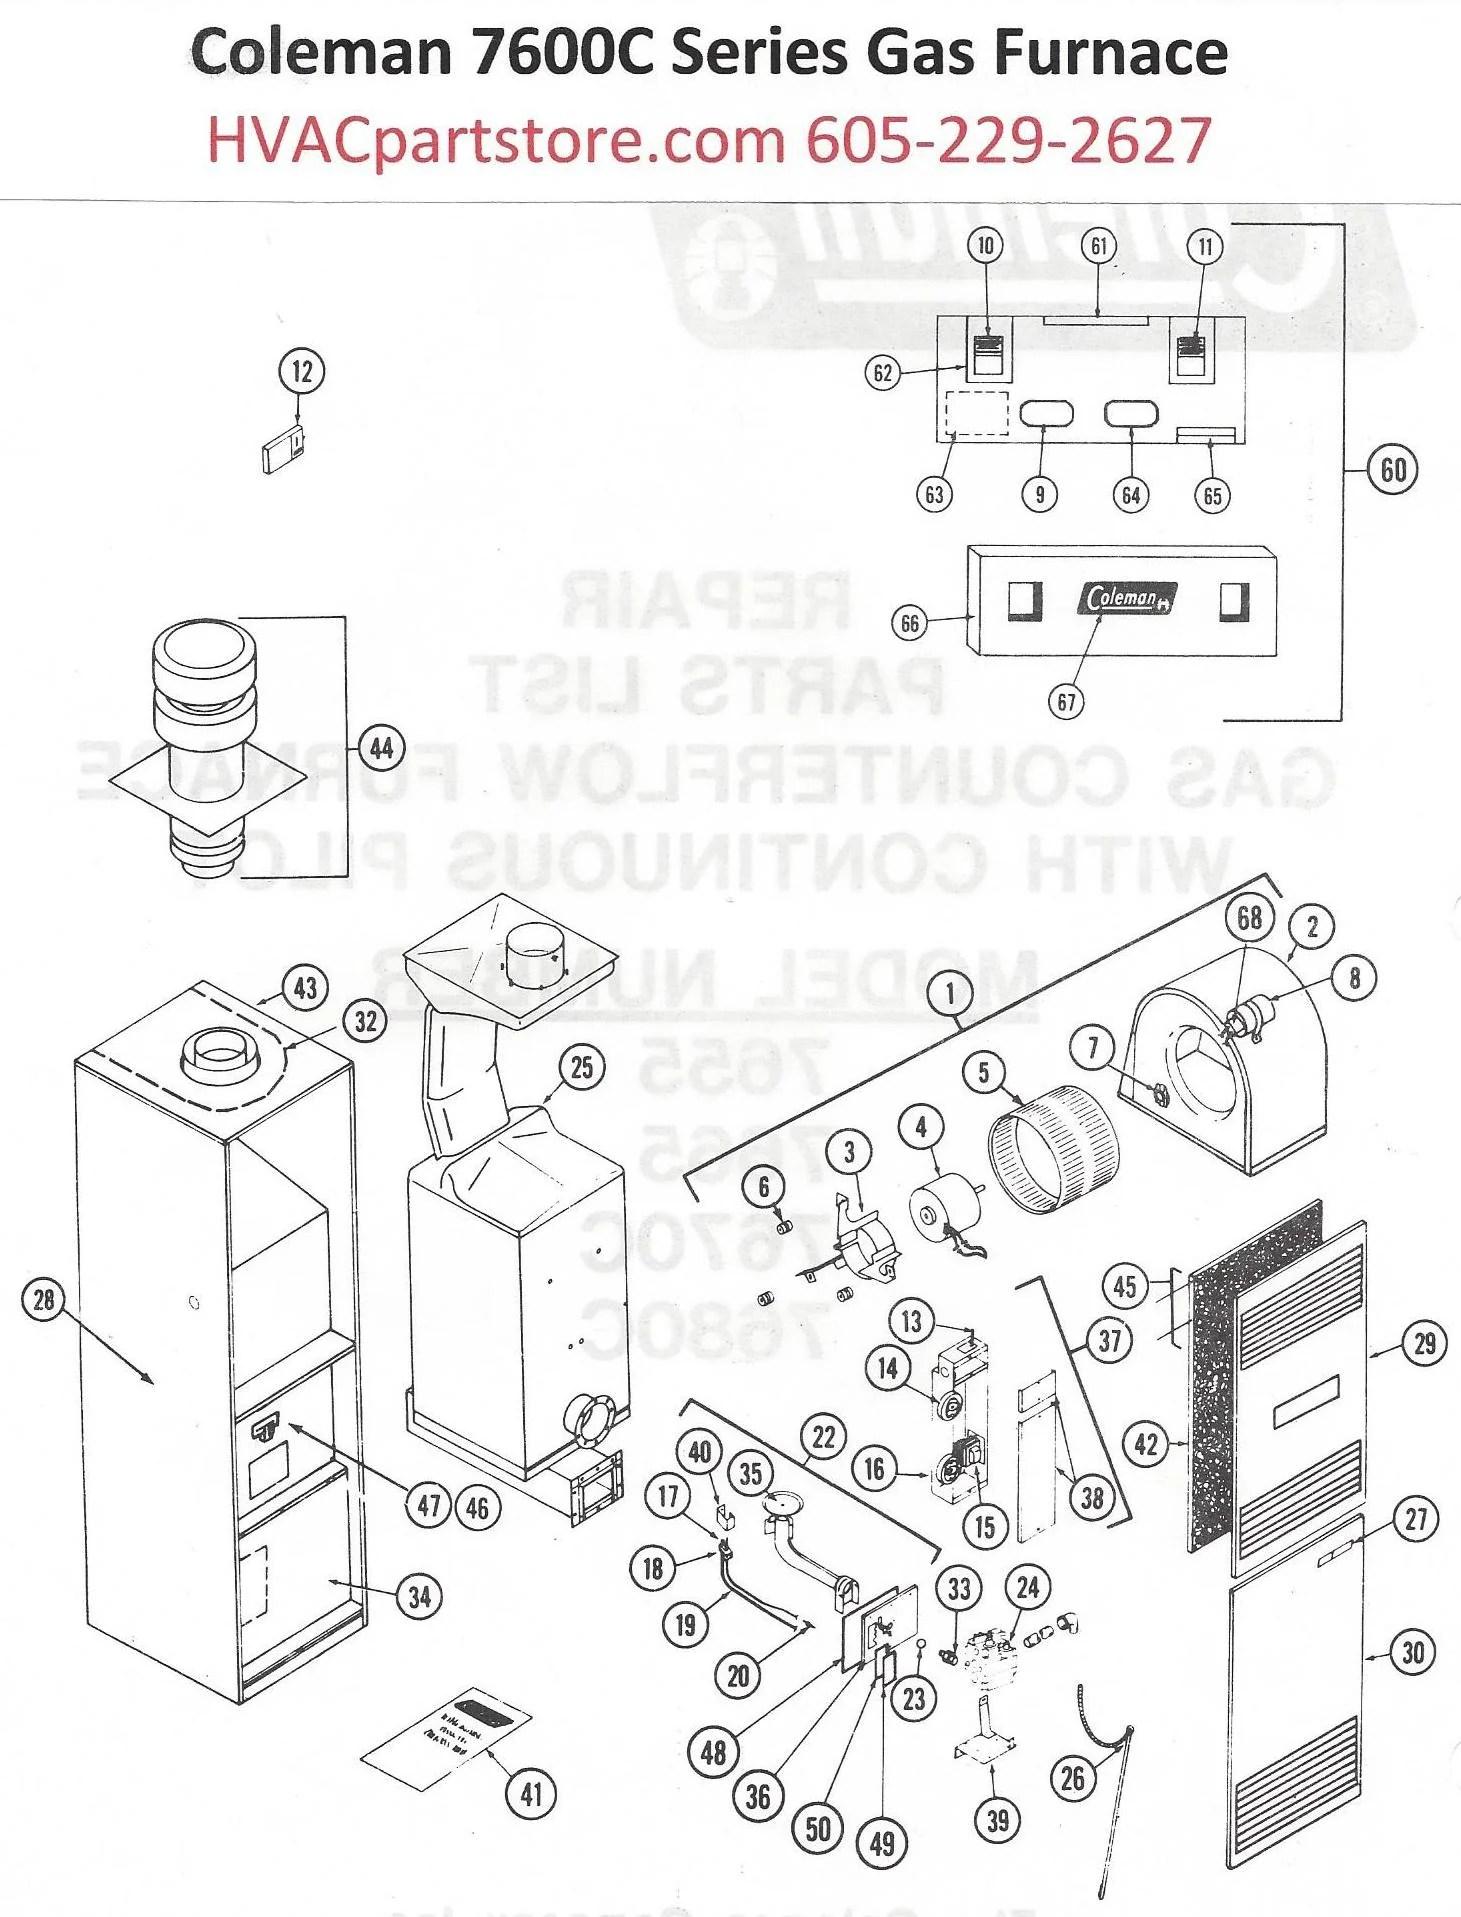 7670C856 Coleman Gas Furnace Parts  HVACpartstore